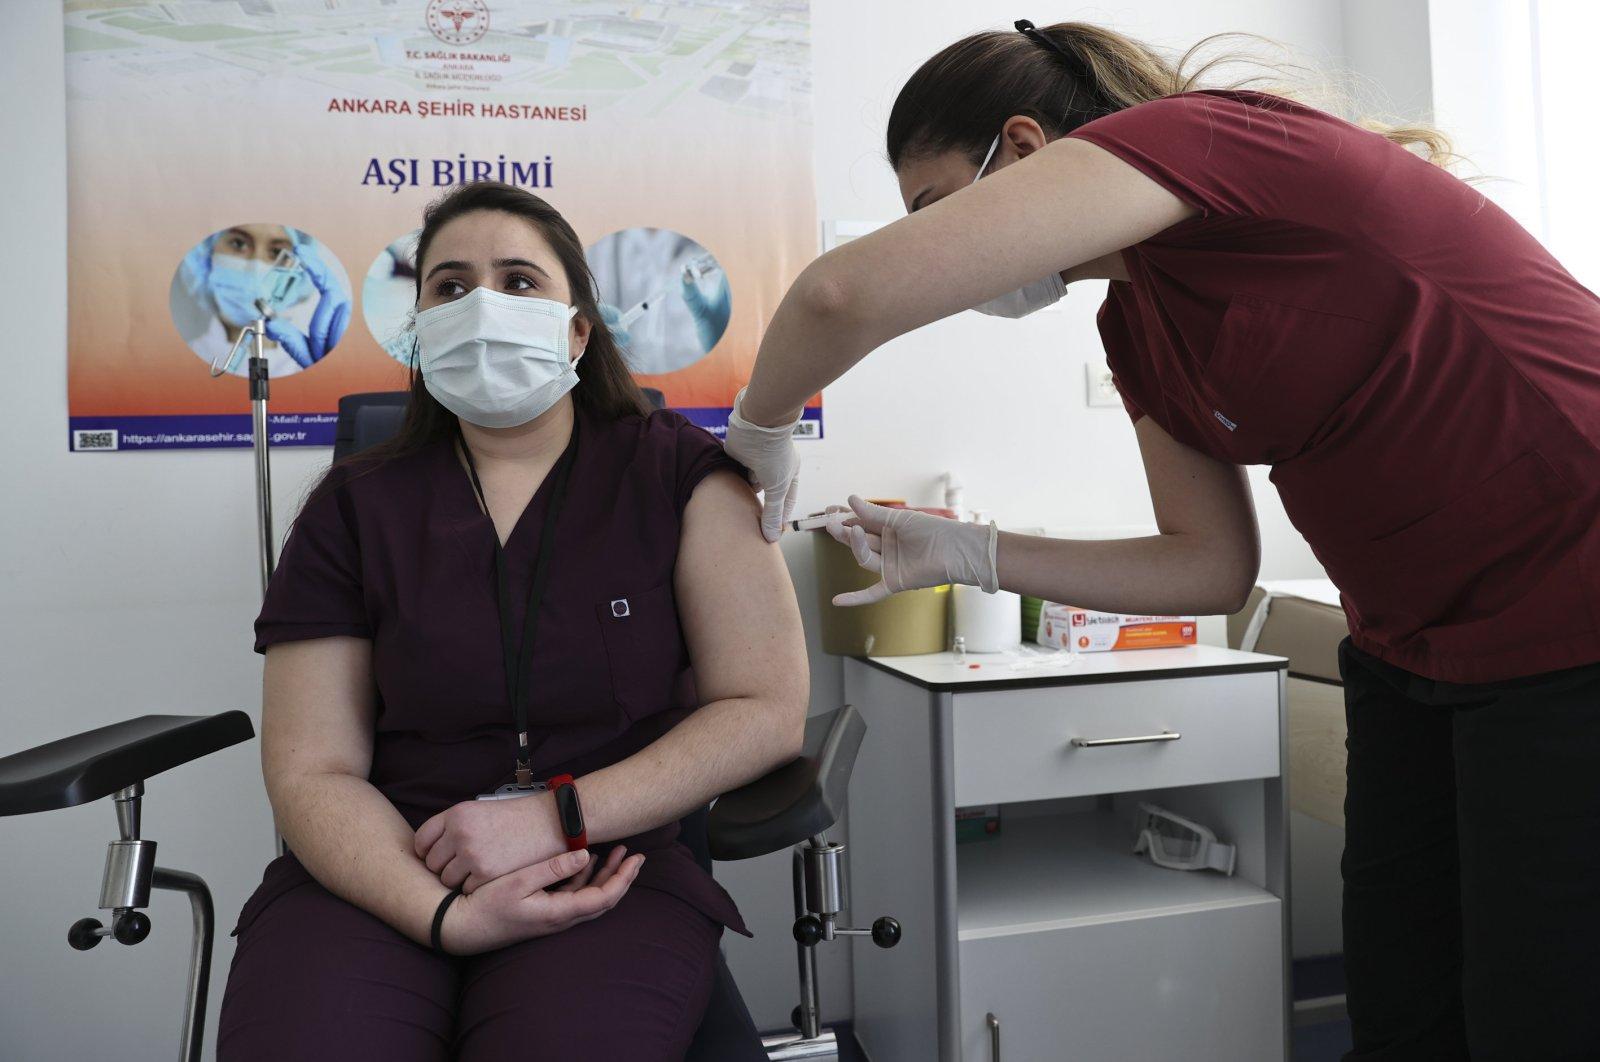 A health care worker gets vaccinated with CoronaVac, in the capital Ankara, Turkey, Jan. 20, 2021. (AA PHOTO)